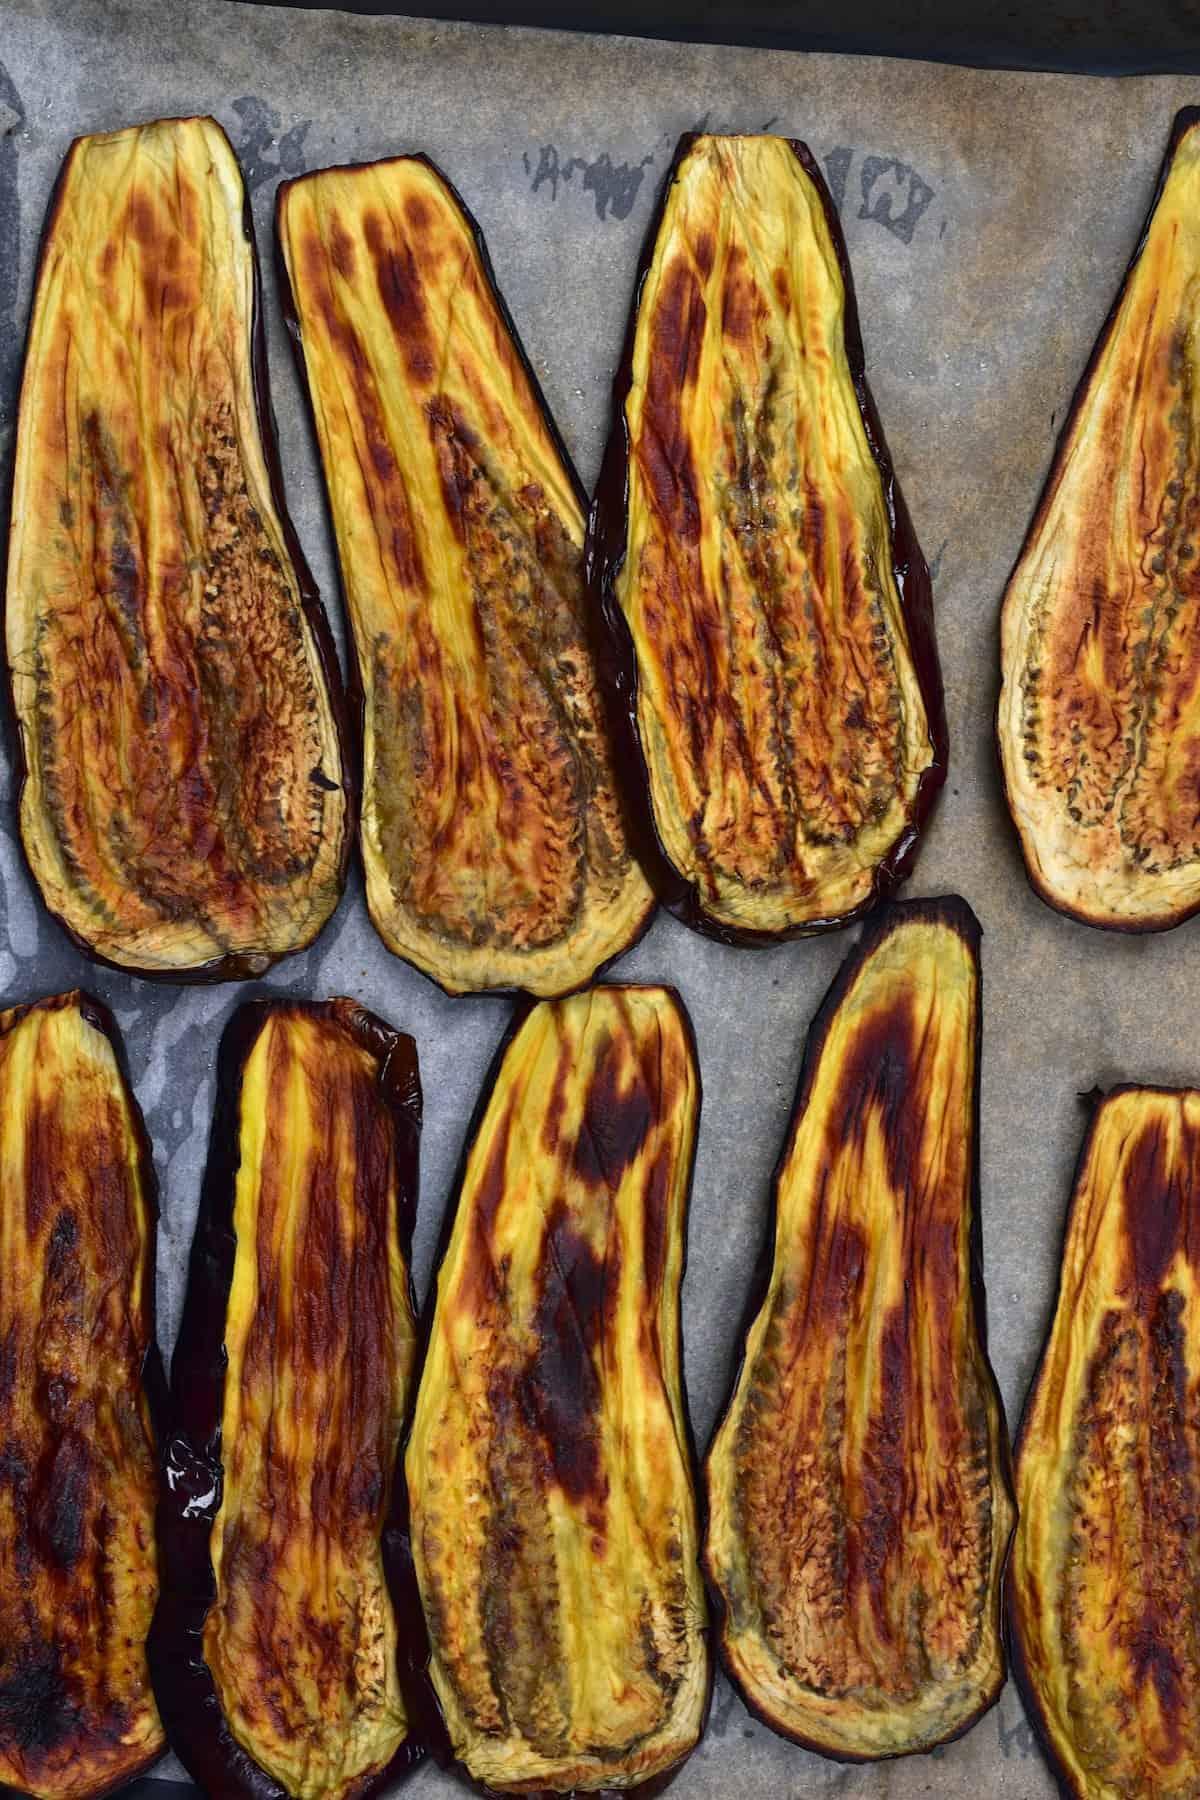 Baked eggplant slices